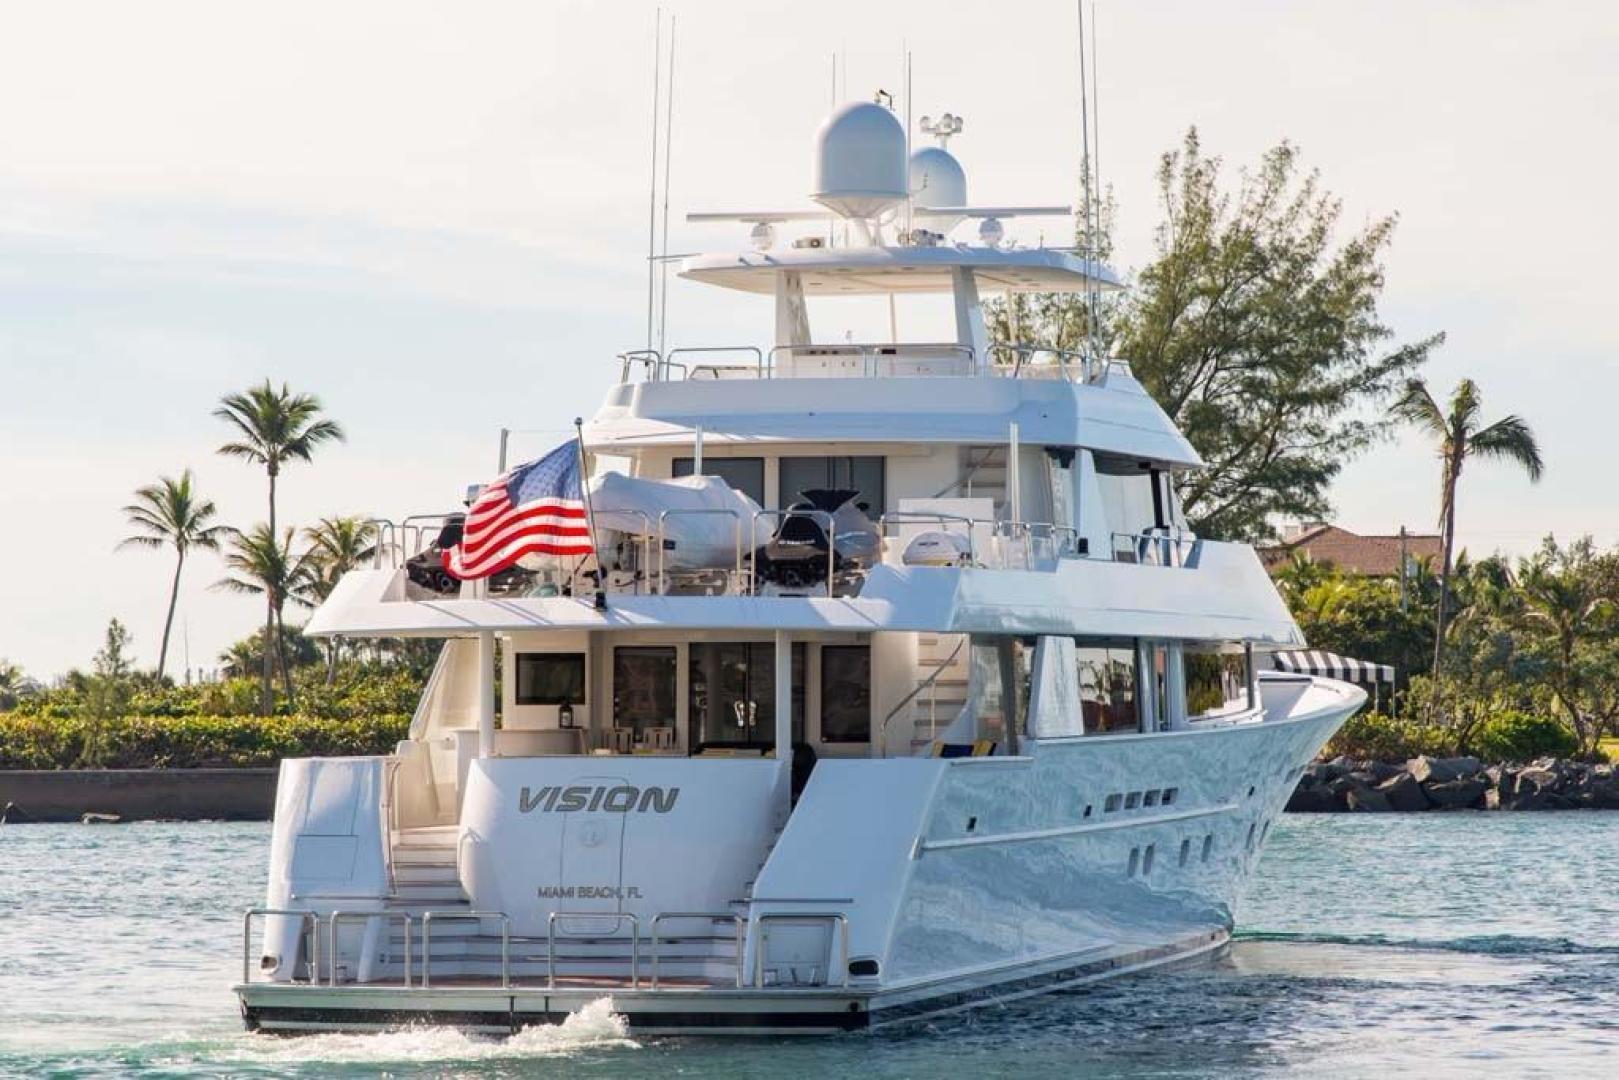 Westport-Tri-Deck 2003-Vision Jupiter-Florida-United States-Stern View-370758 | Thumbnail